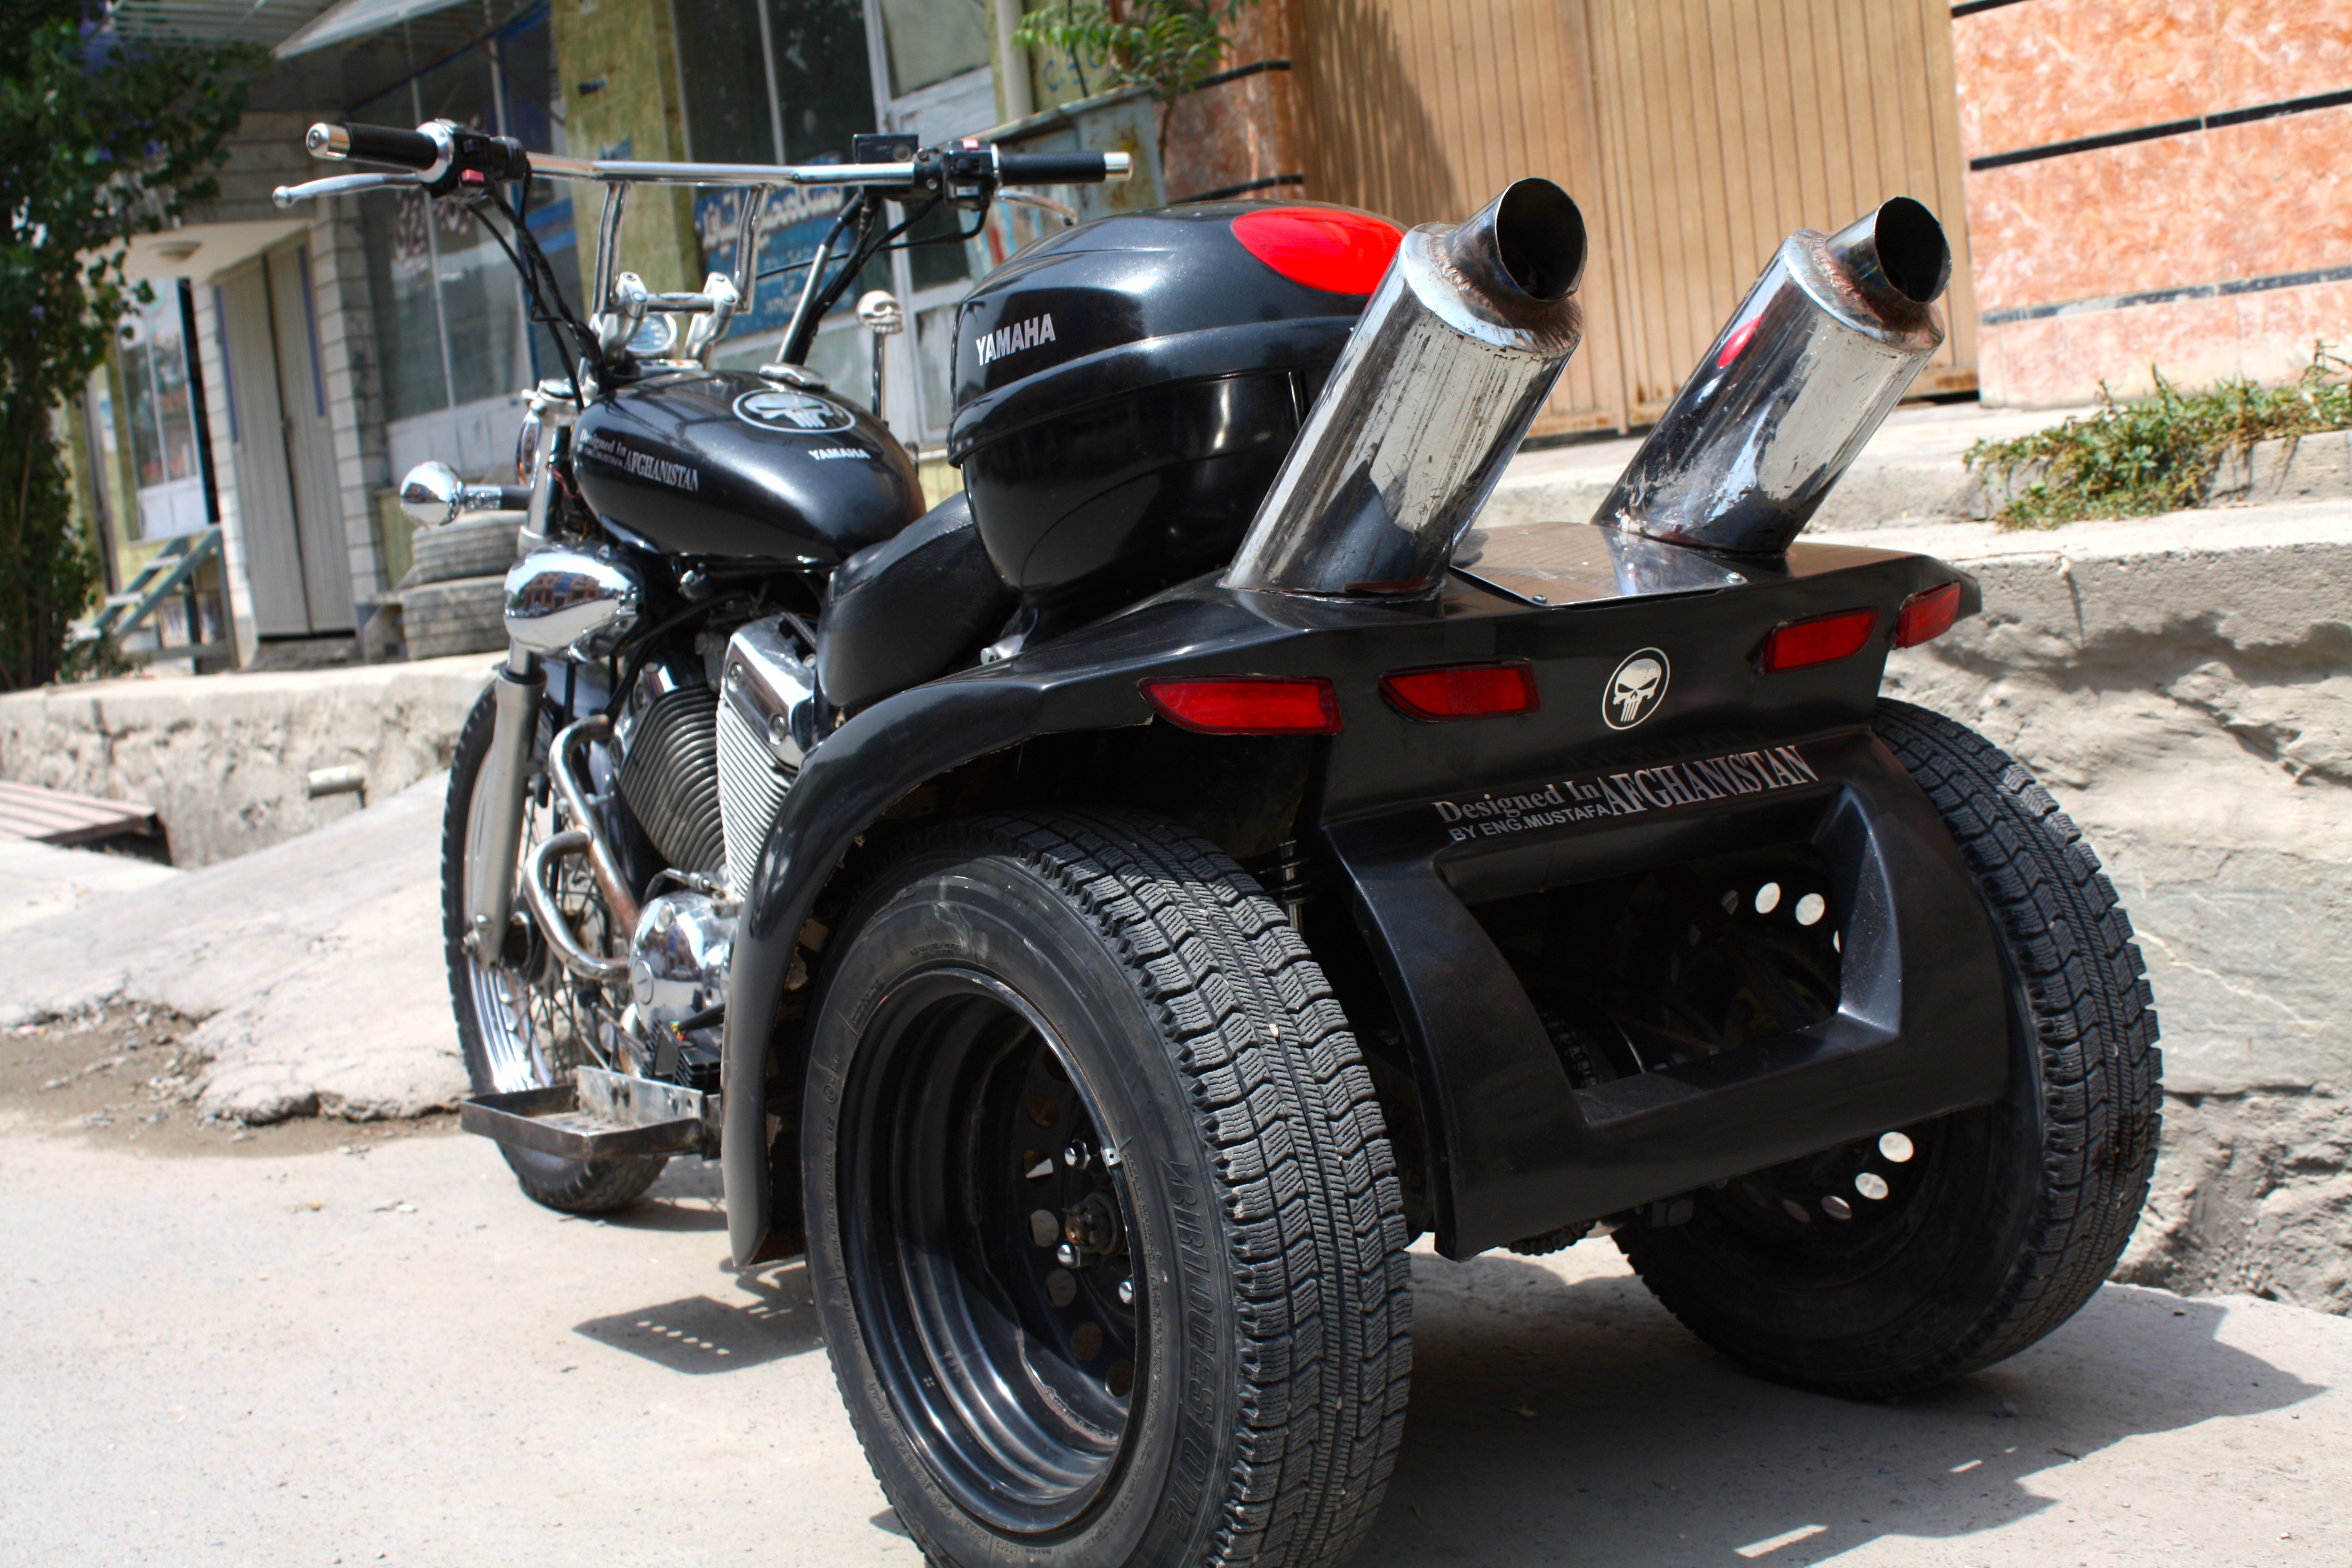 The prototype cost around 50 thousand afghani (under $1,000). (Photo by Zahra Khodadadi)